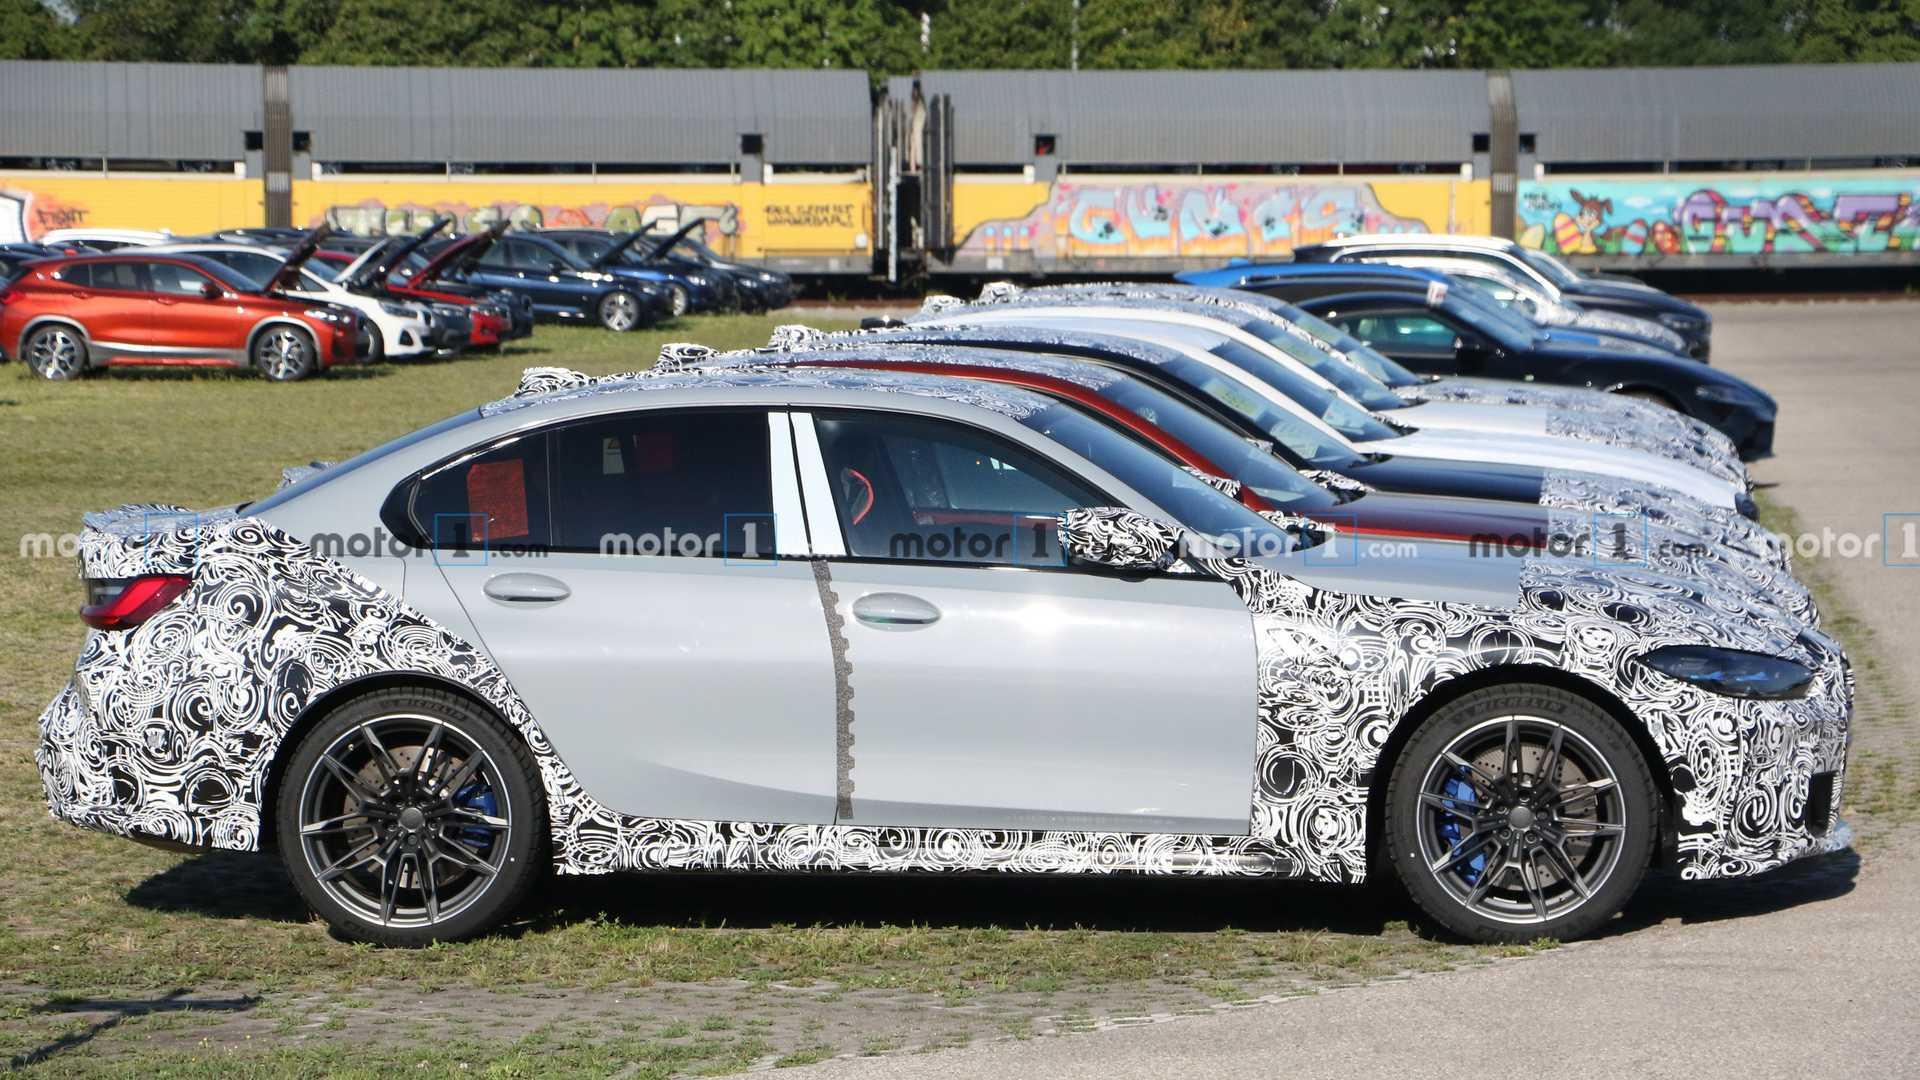 2021-bmw-m3-sedan-light-camo